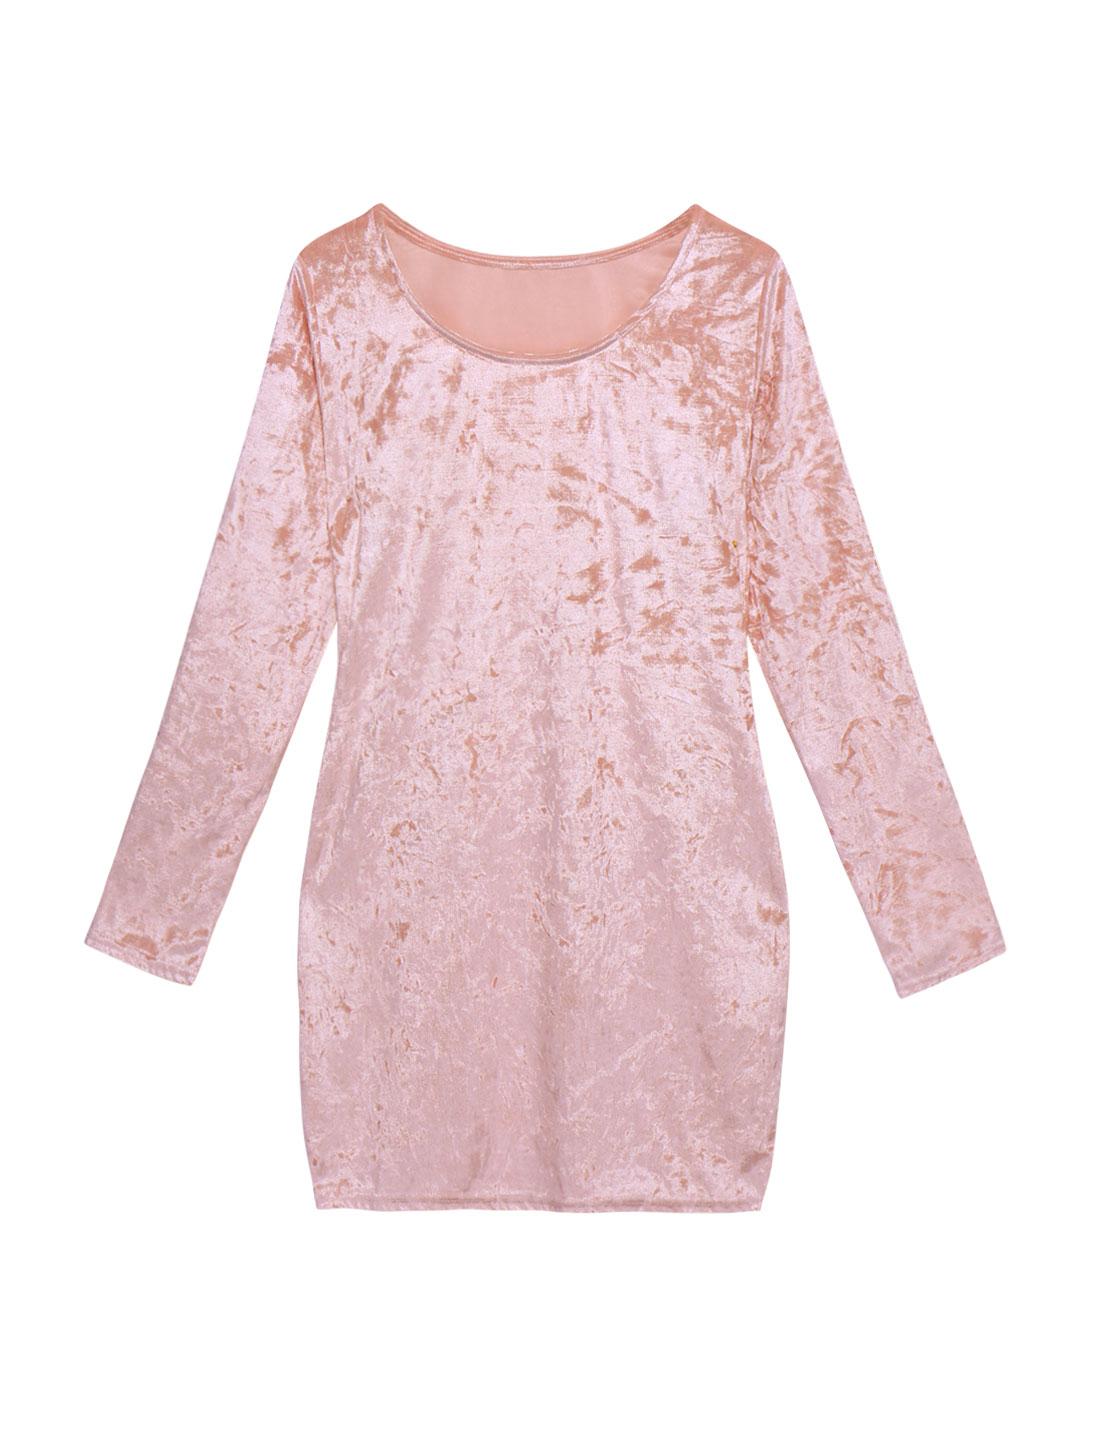 Women Scoop Neck Long Sleeves Velvet Tunic Sheath Dress Pink L